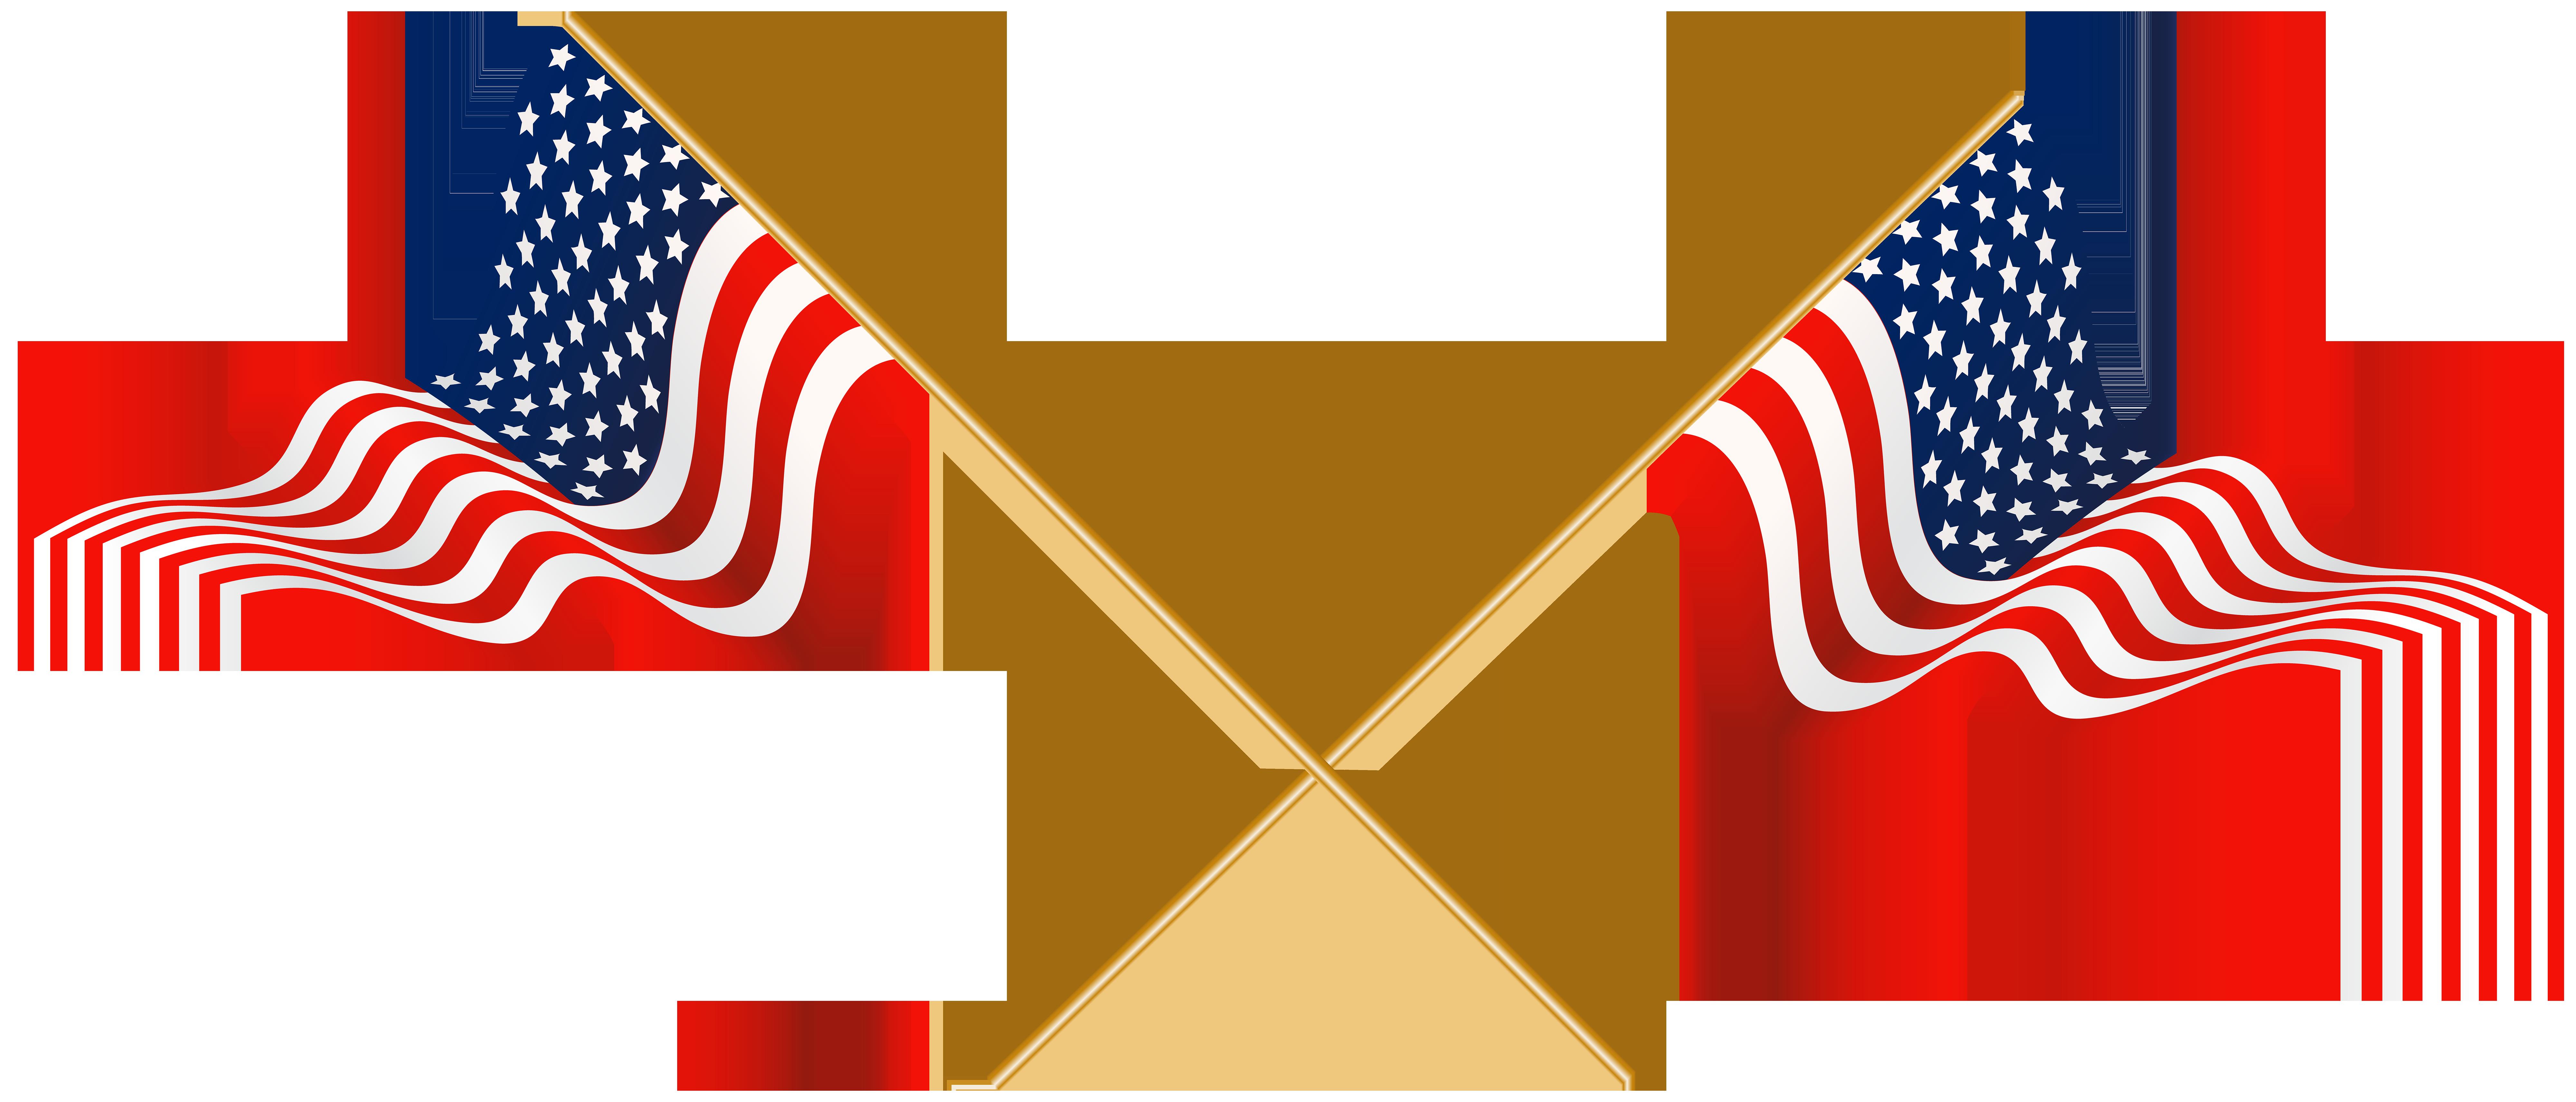 Usa Flag Clipart at GetDrawings.com.